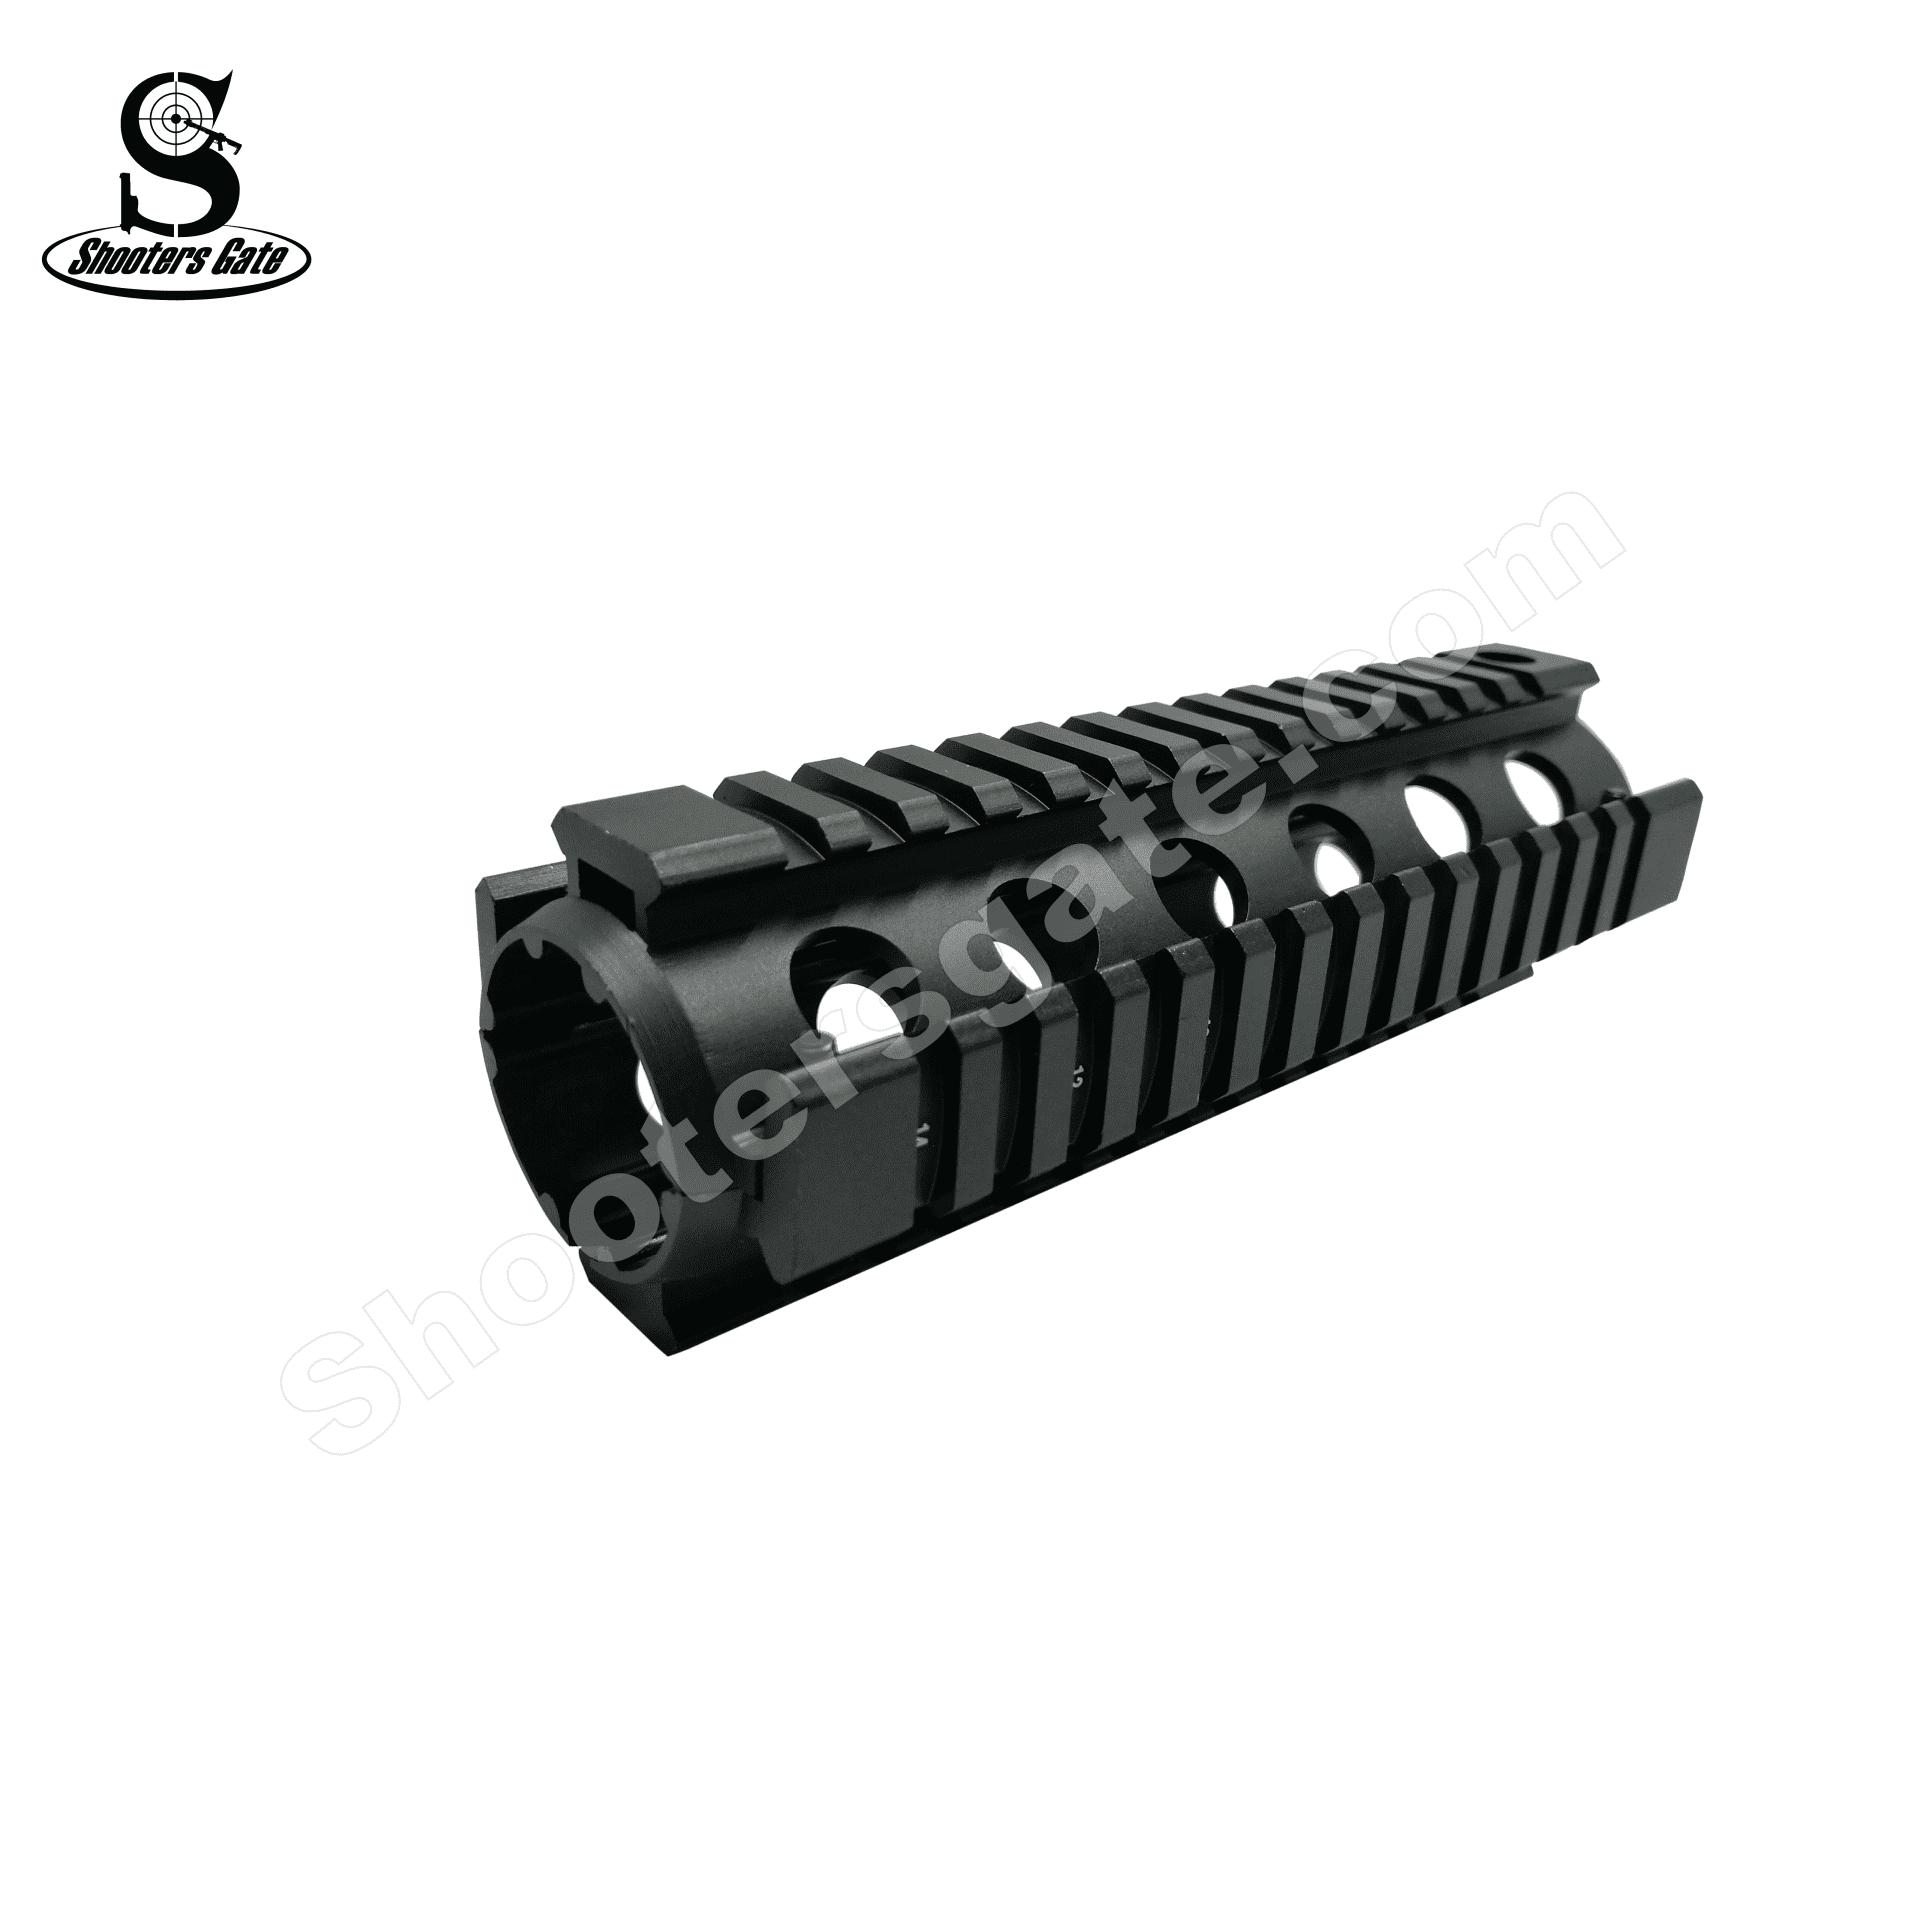 AR15 Two-Piece Drop-in Quadrail Carbine Length - Black